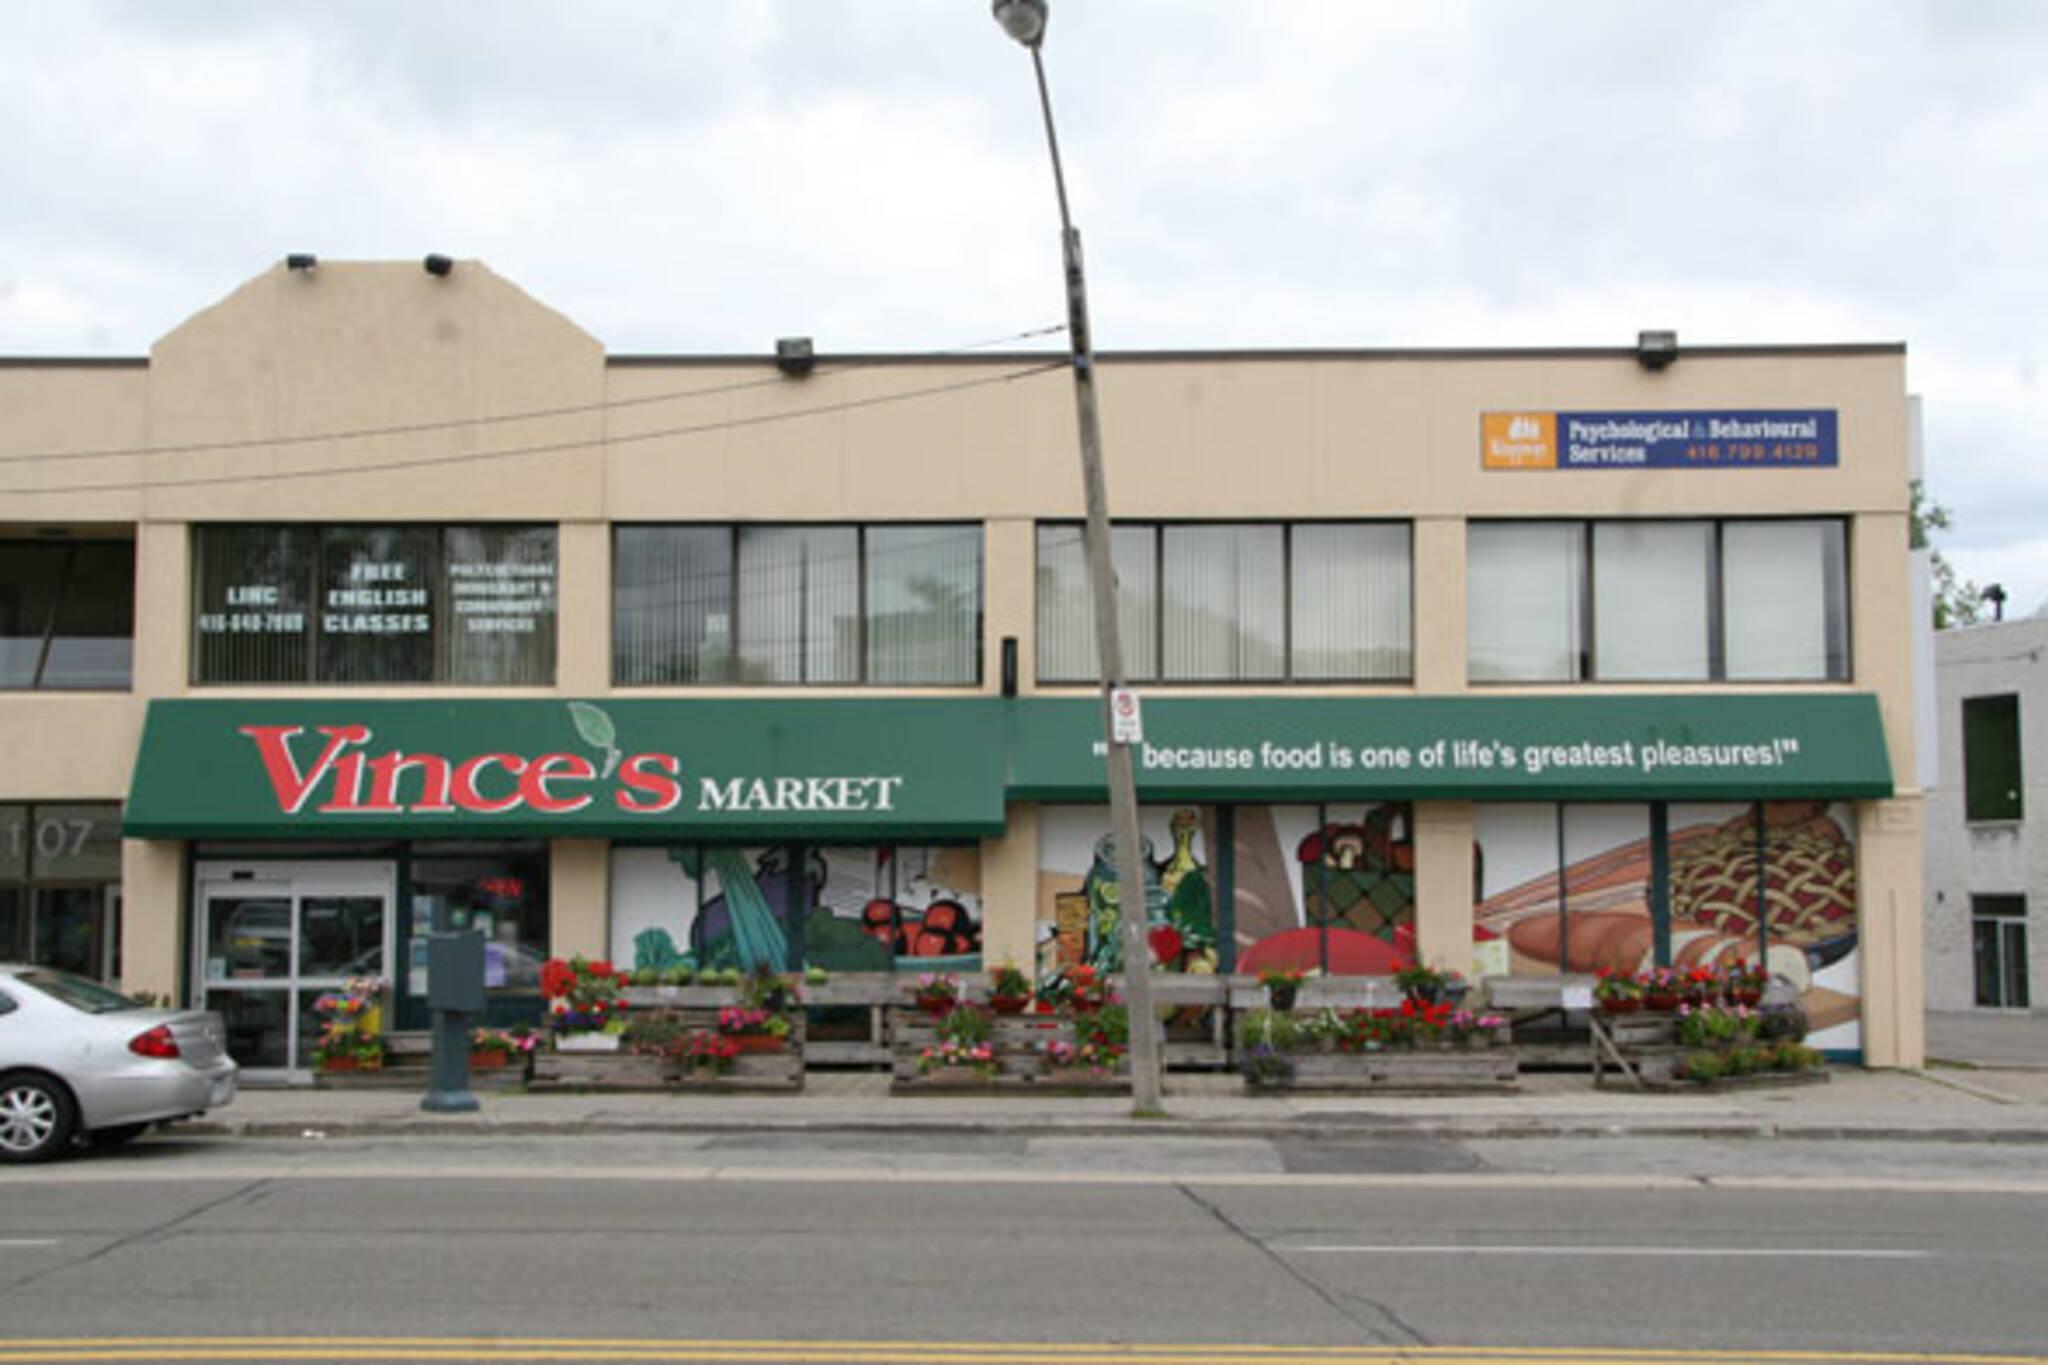 Vince's Market Toronto